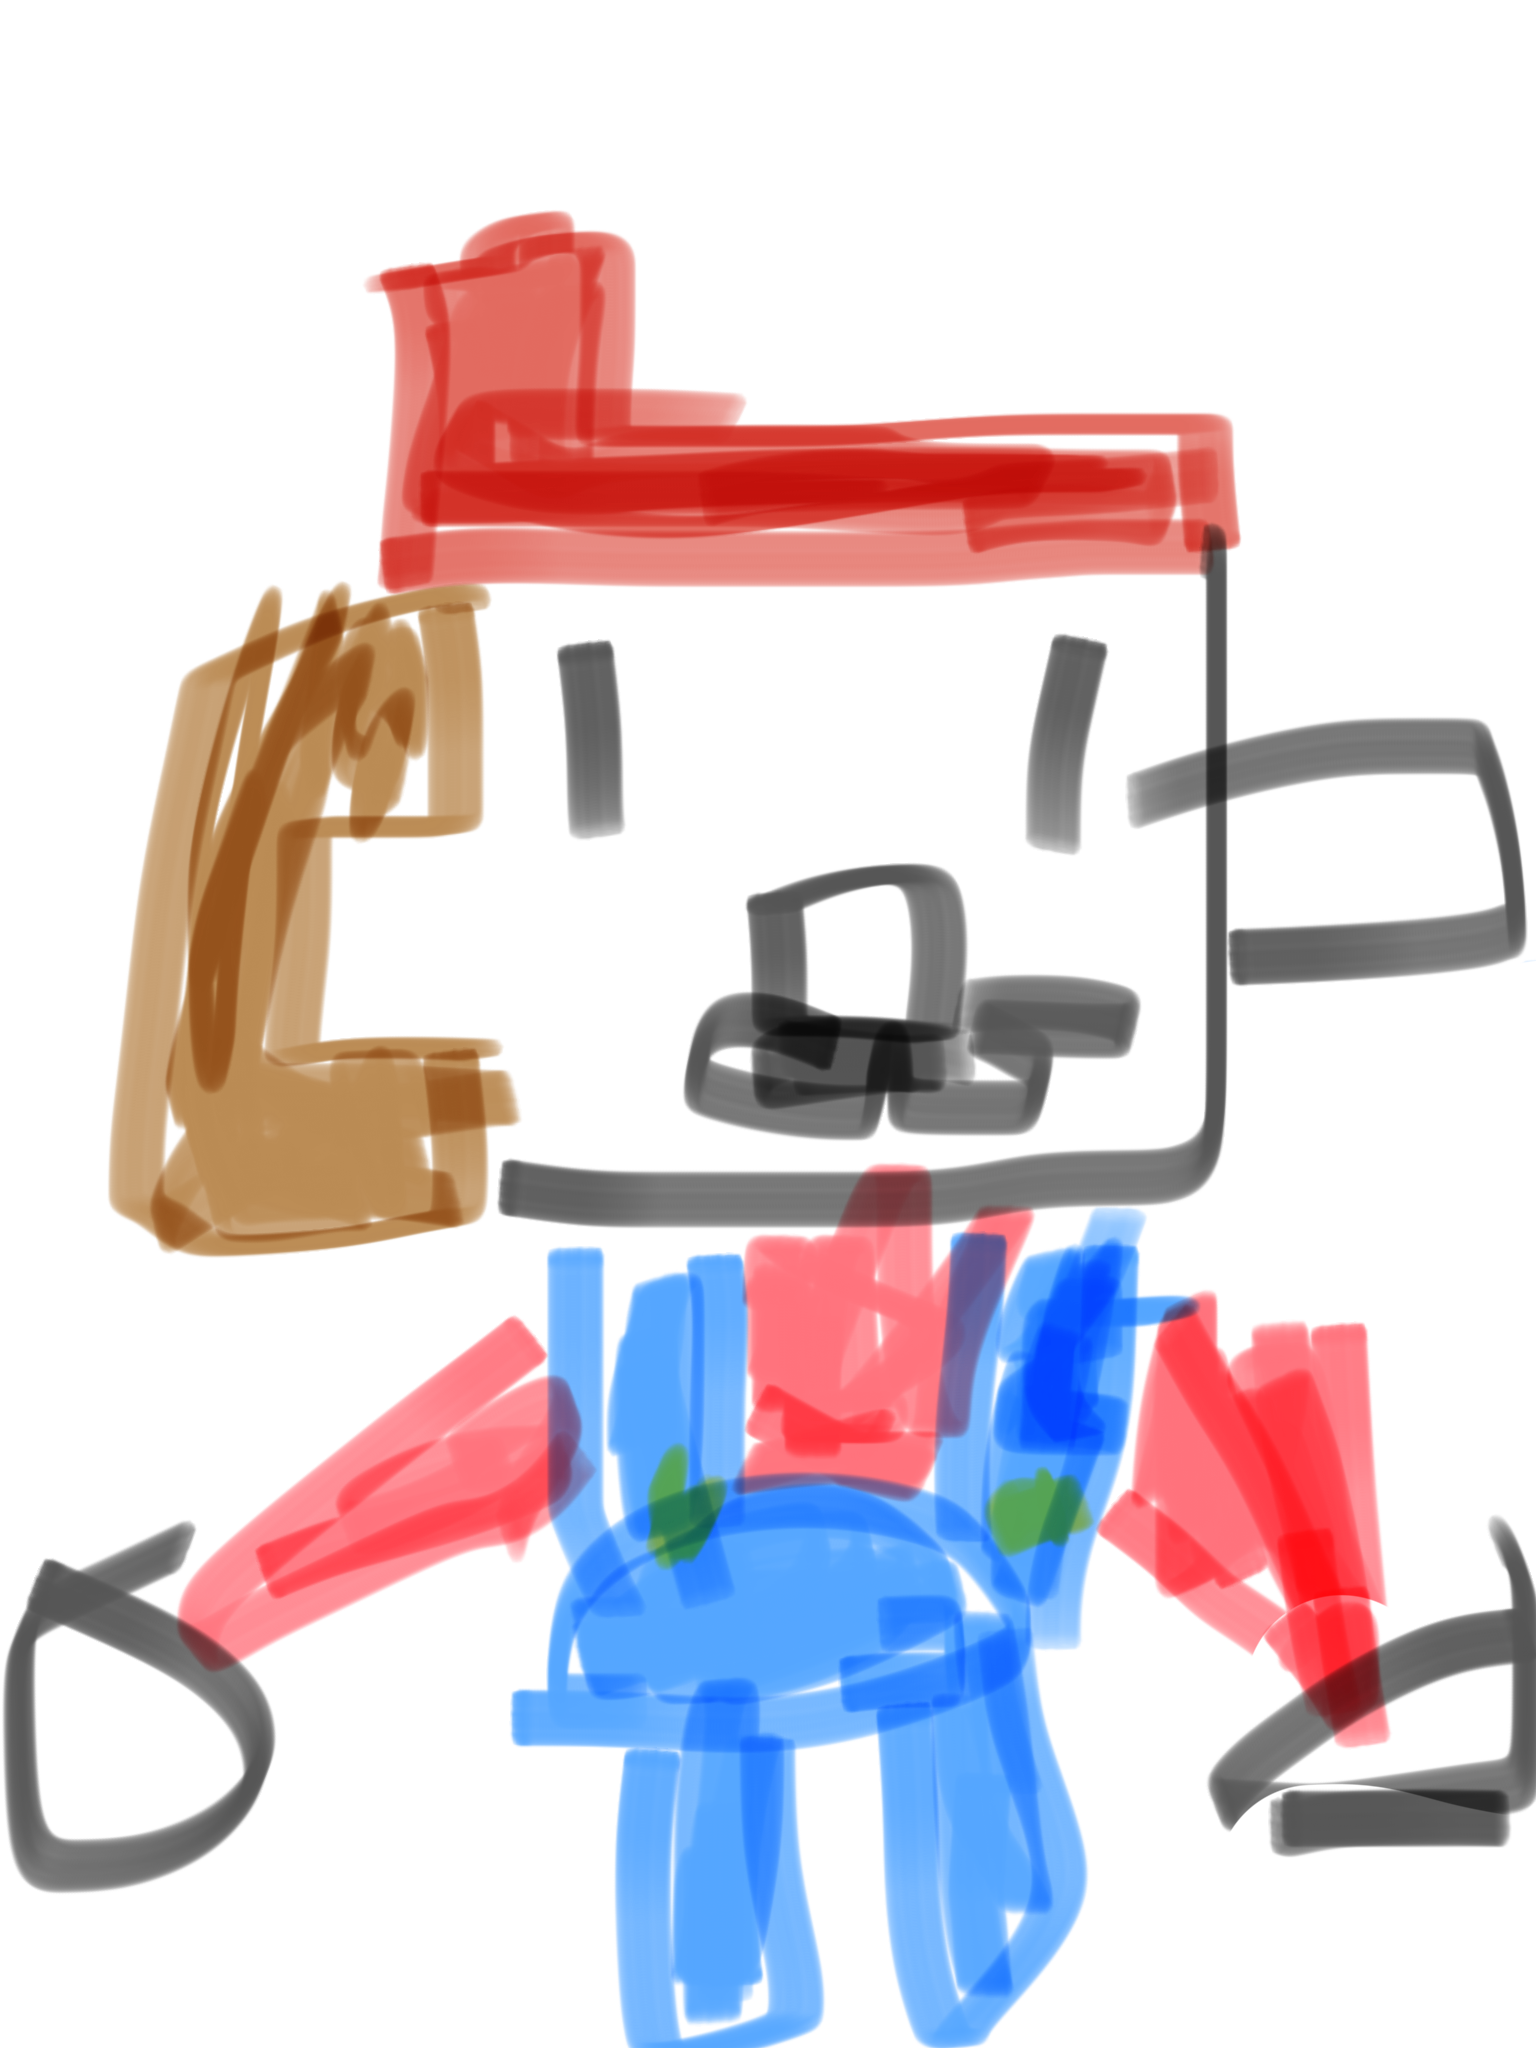 It's Mario with no feet